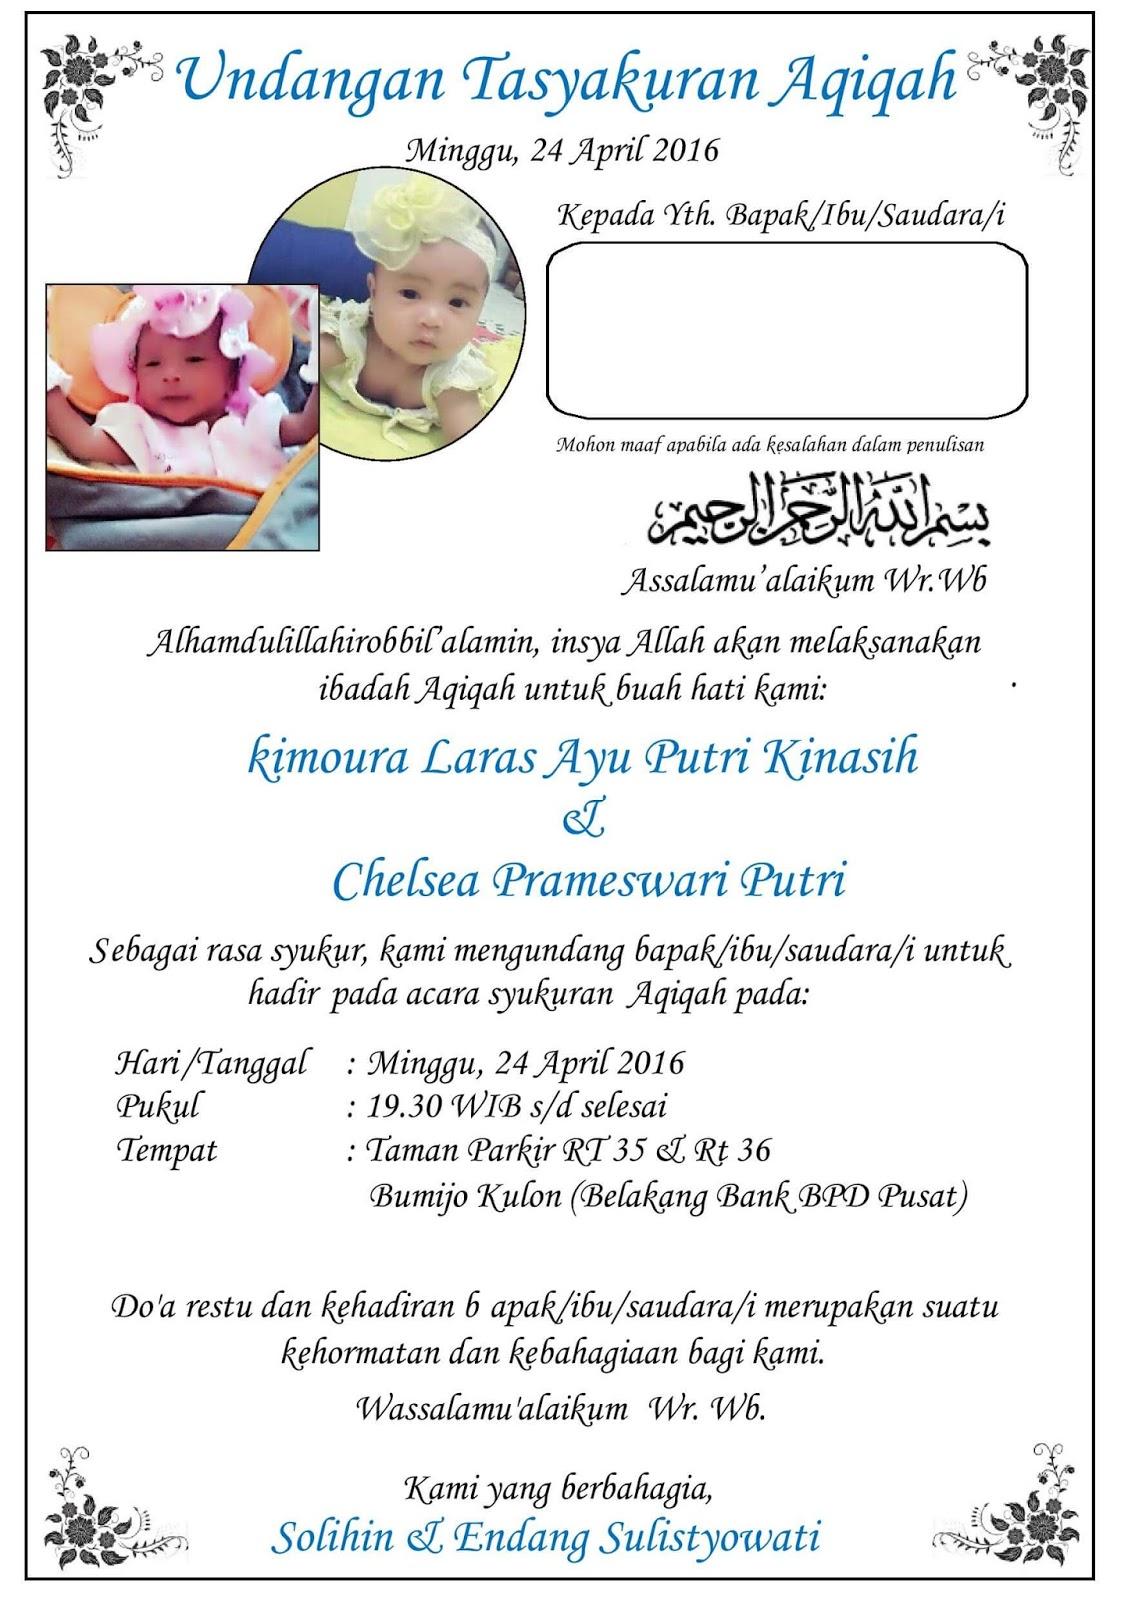 contoh undangan tasyakuran aqiqah